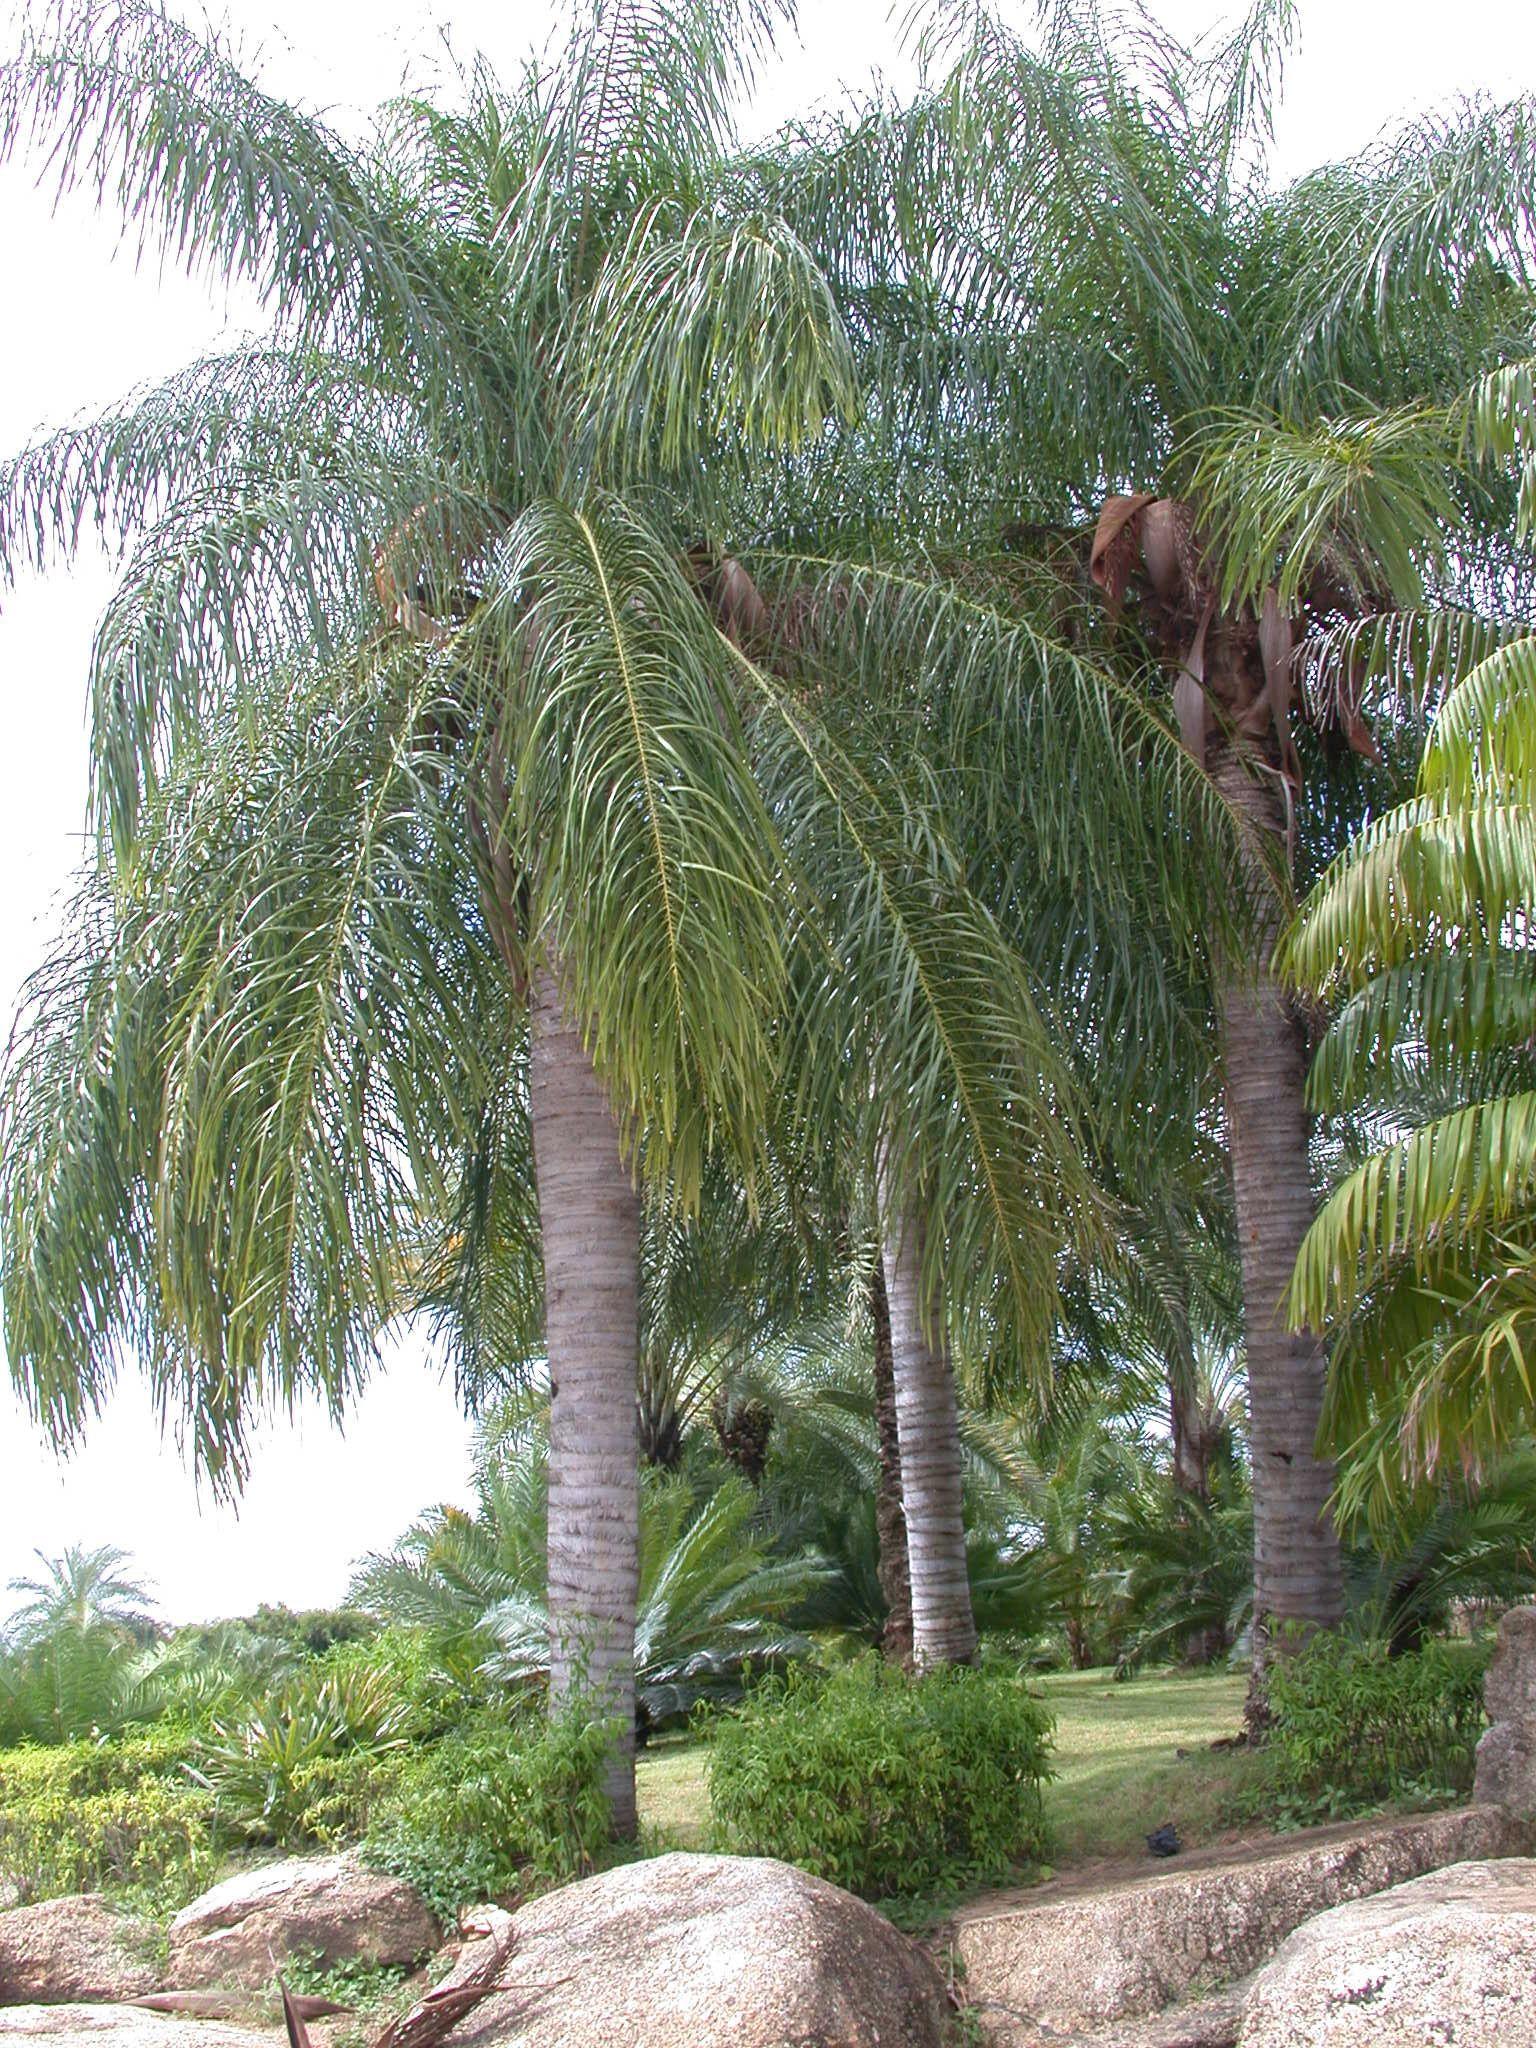 Acrocomia Aculeata Palms In Thailand